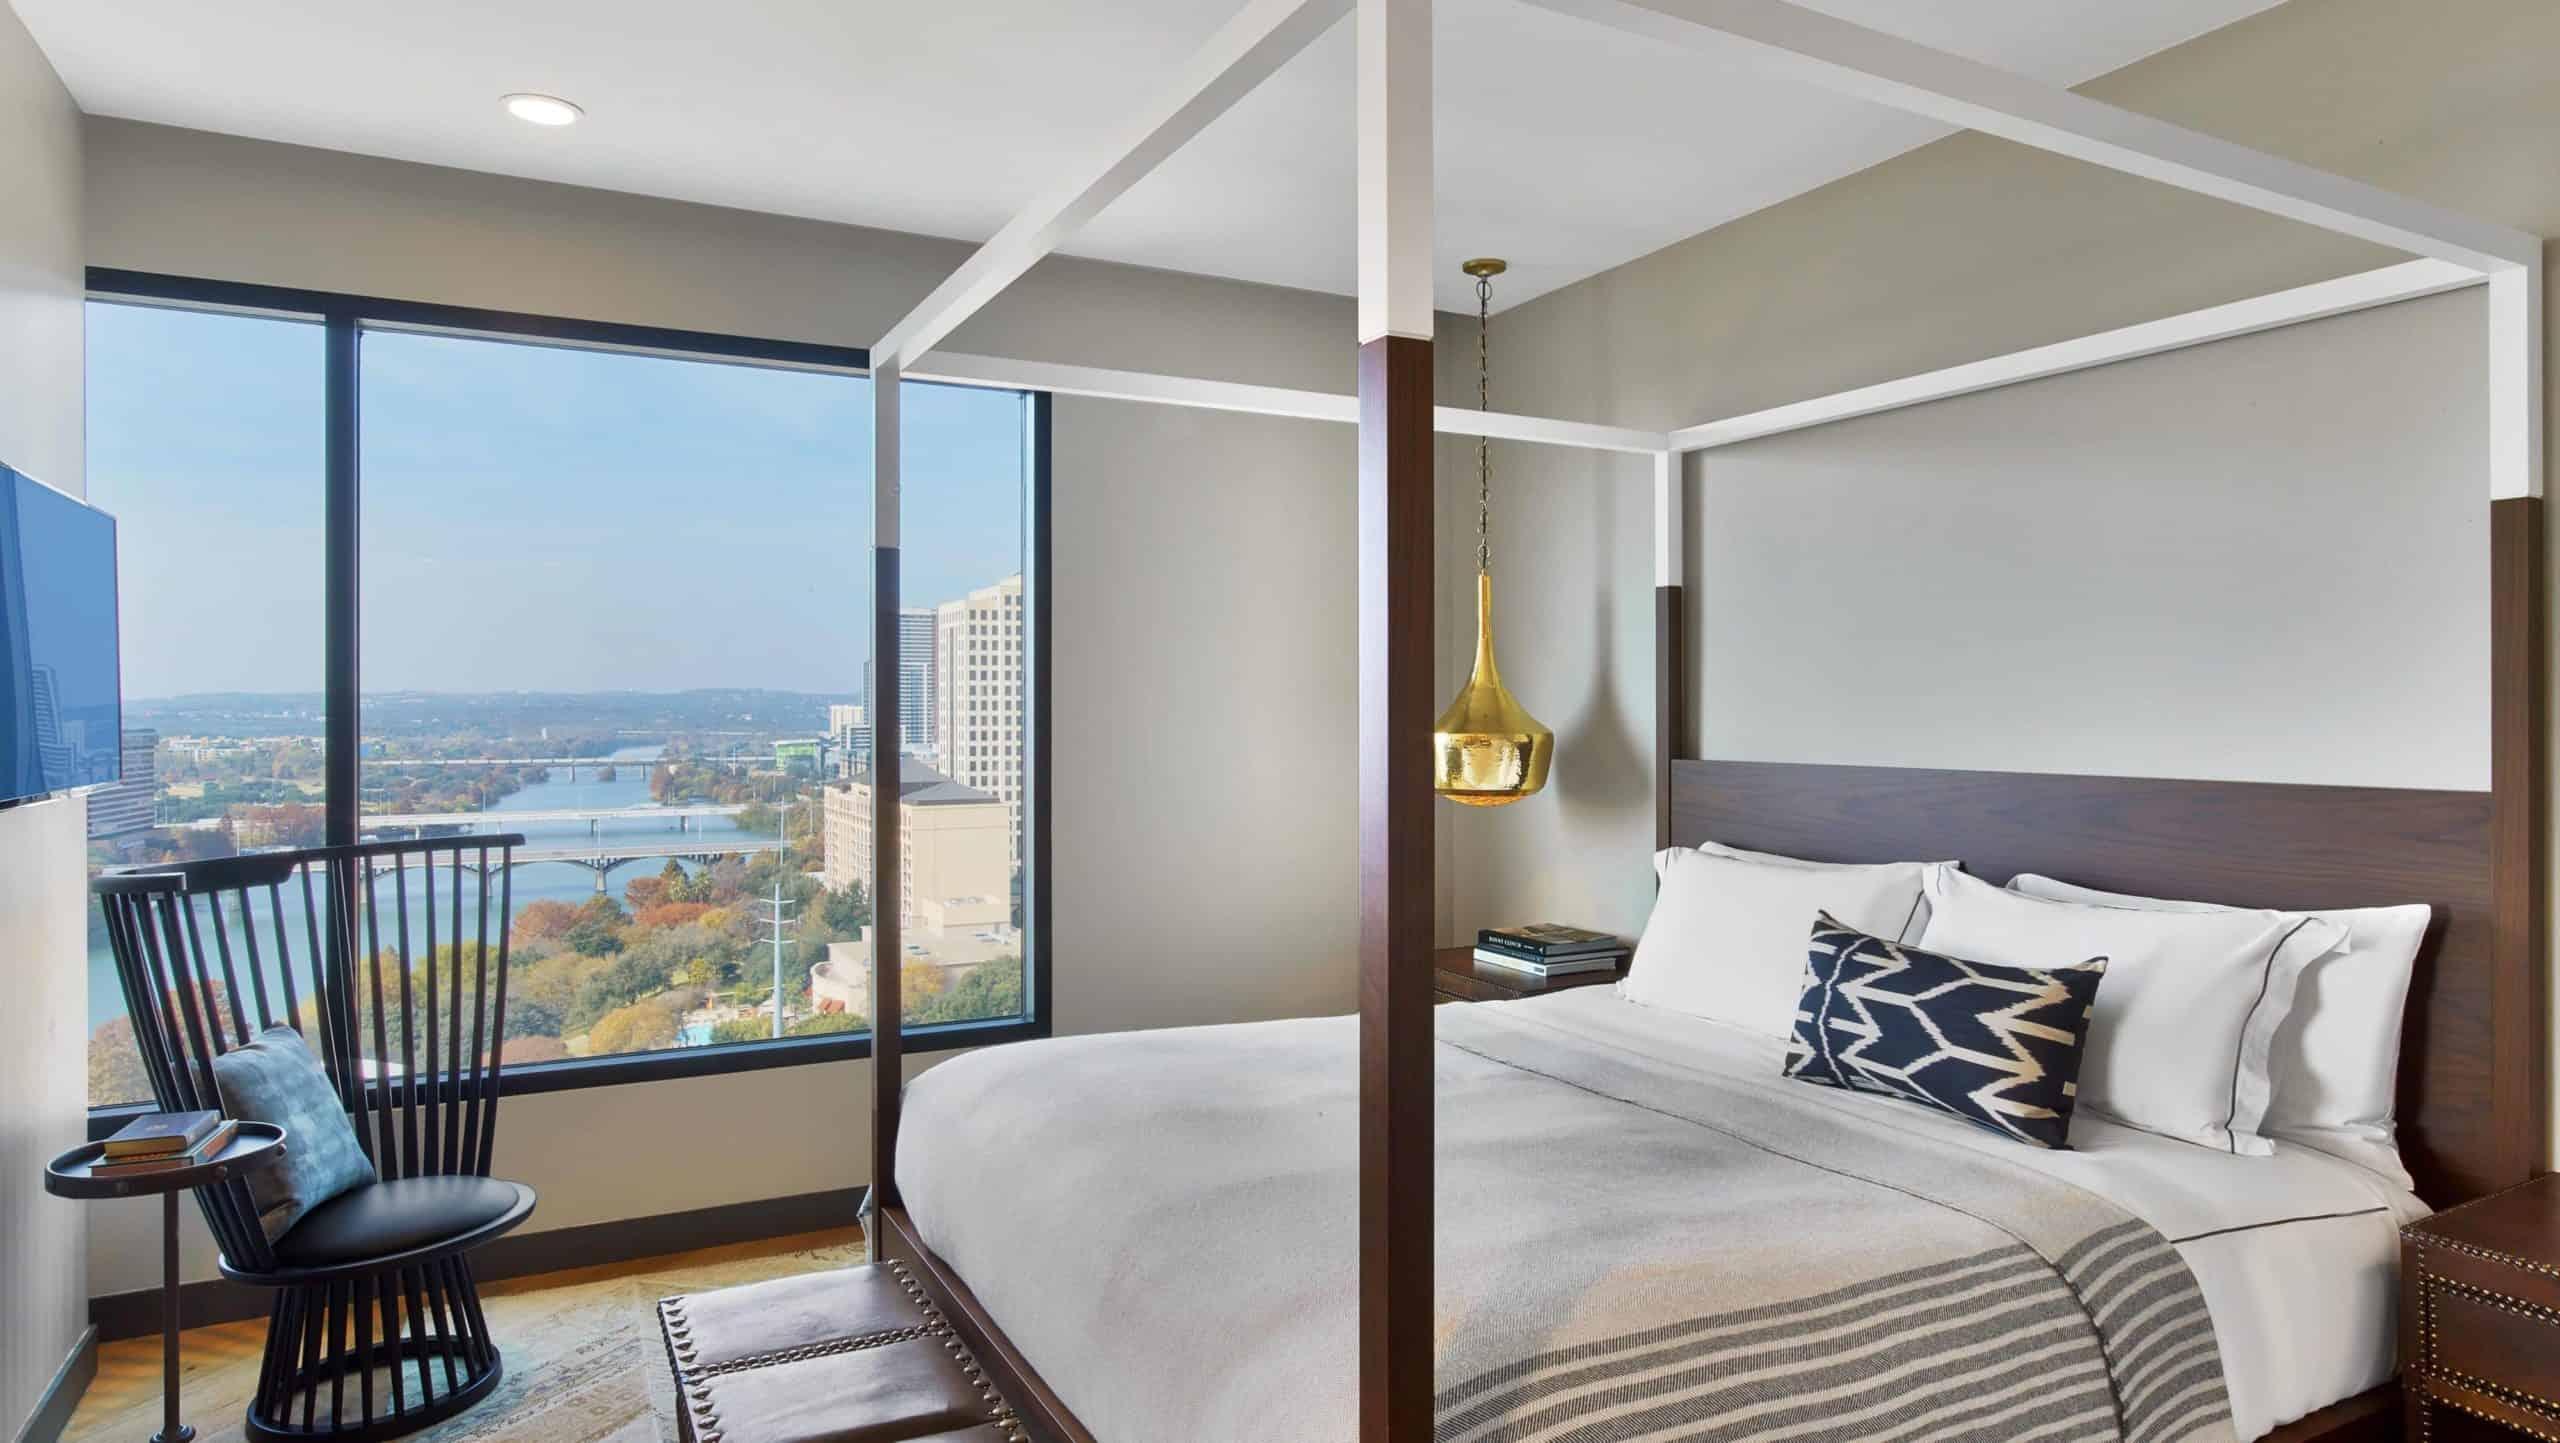 ihg hotels for family - Kimpton Hotel Van Zandt, Austin